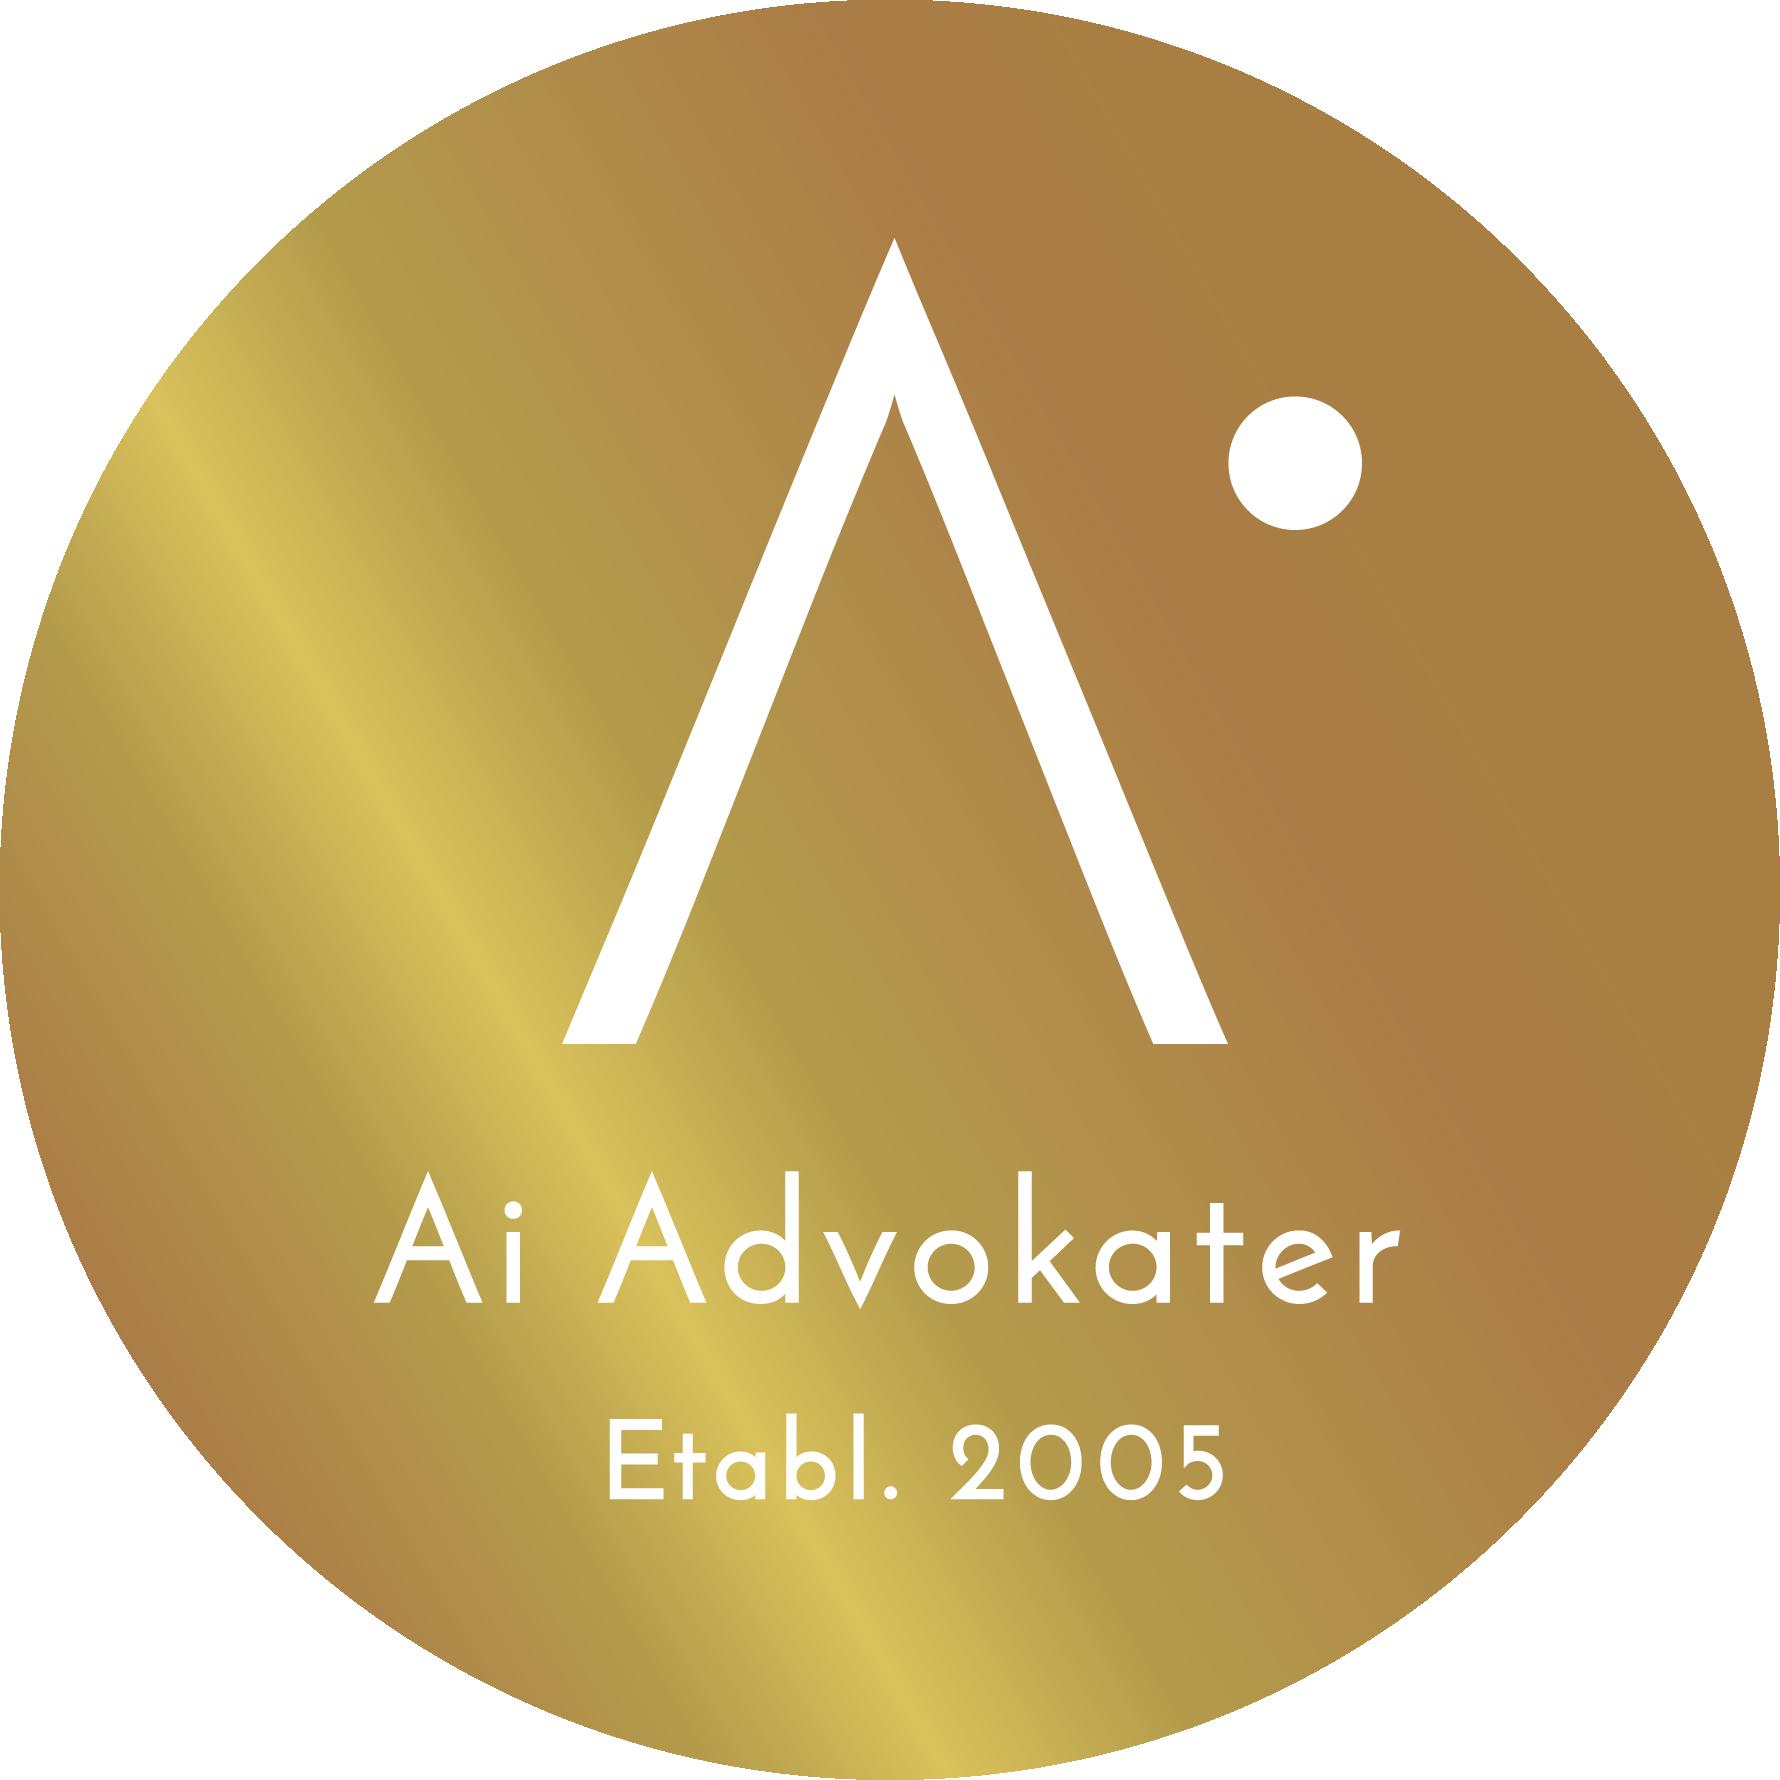 Advokatfirman Ingvarsdotter AB